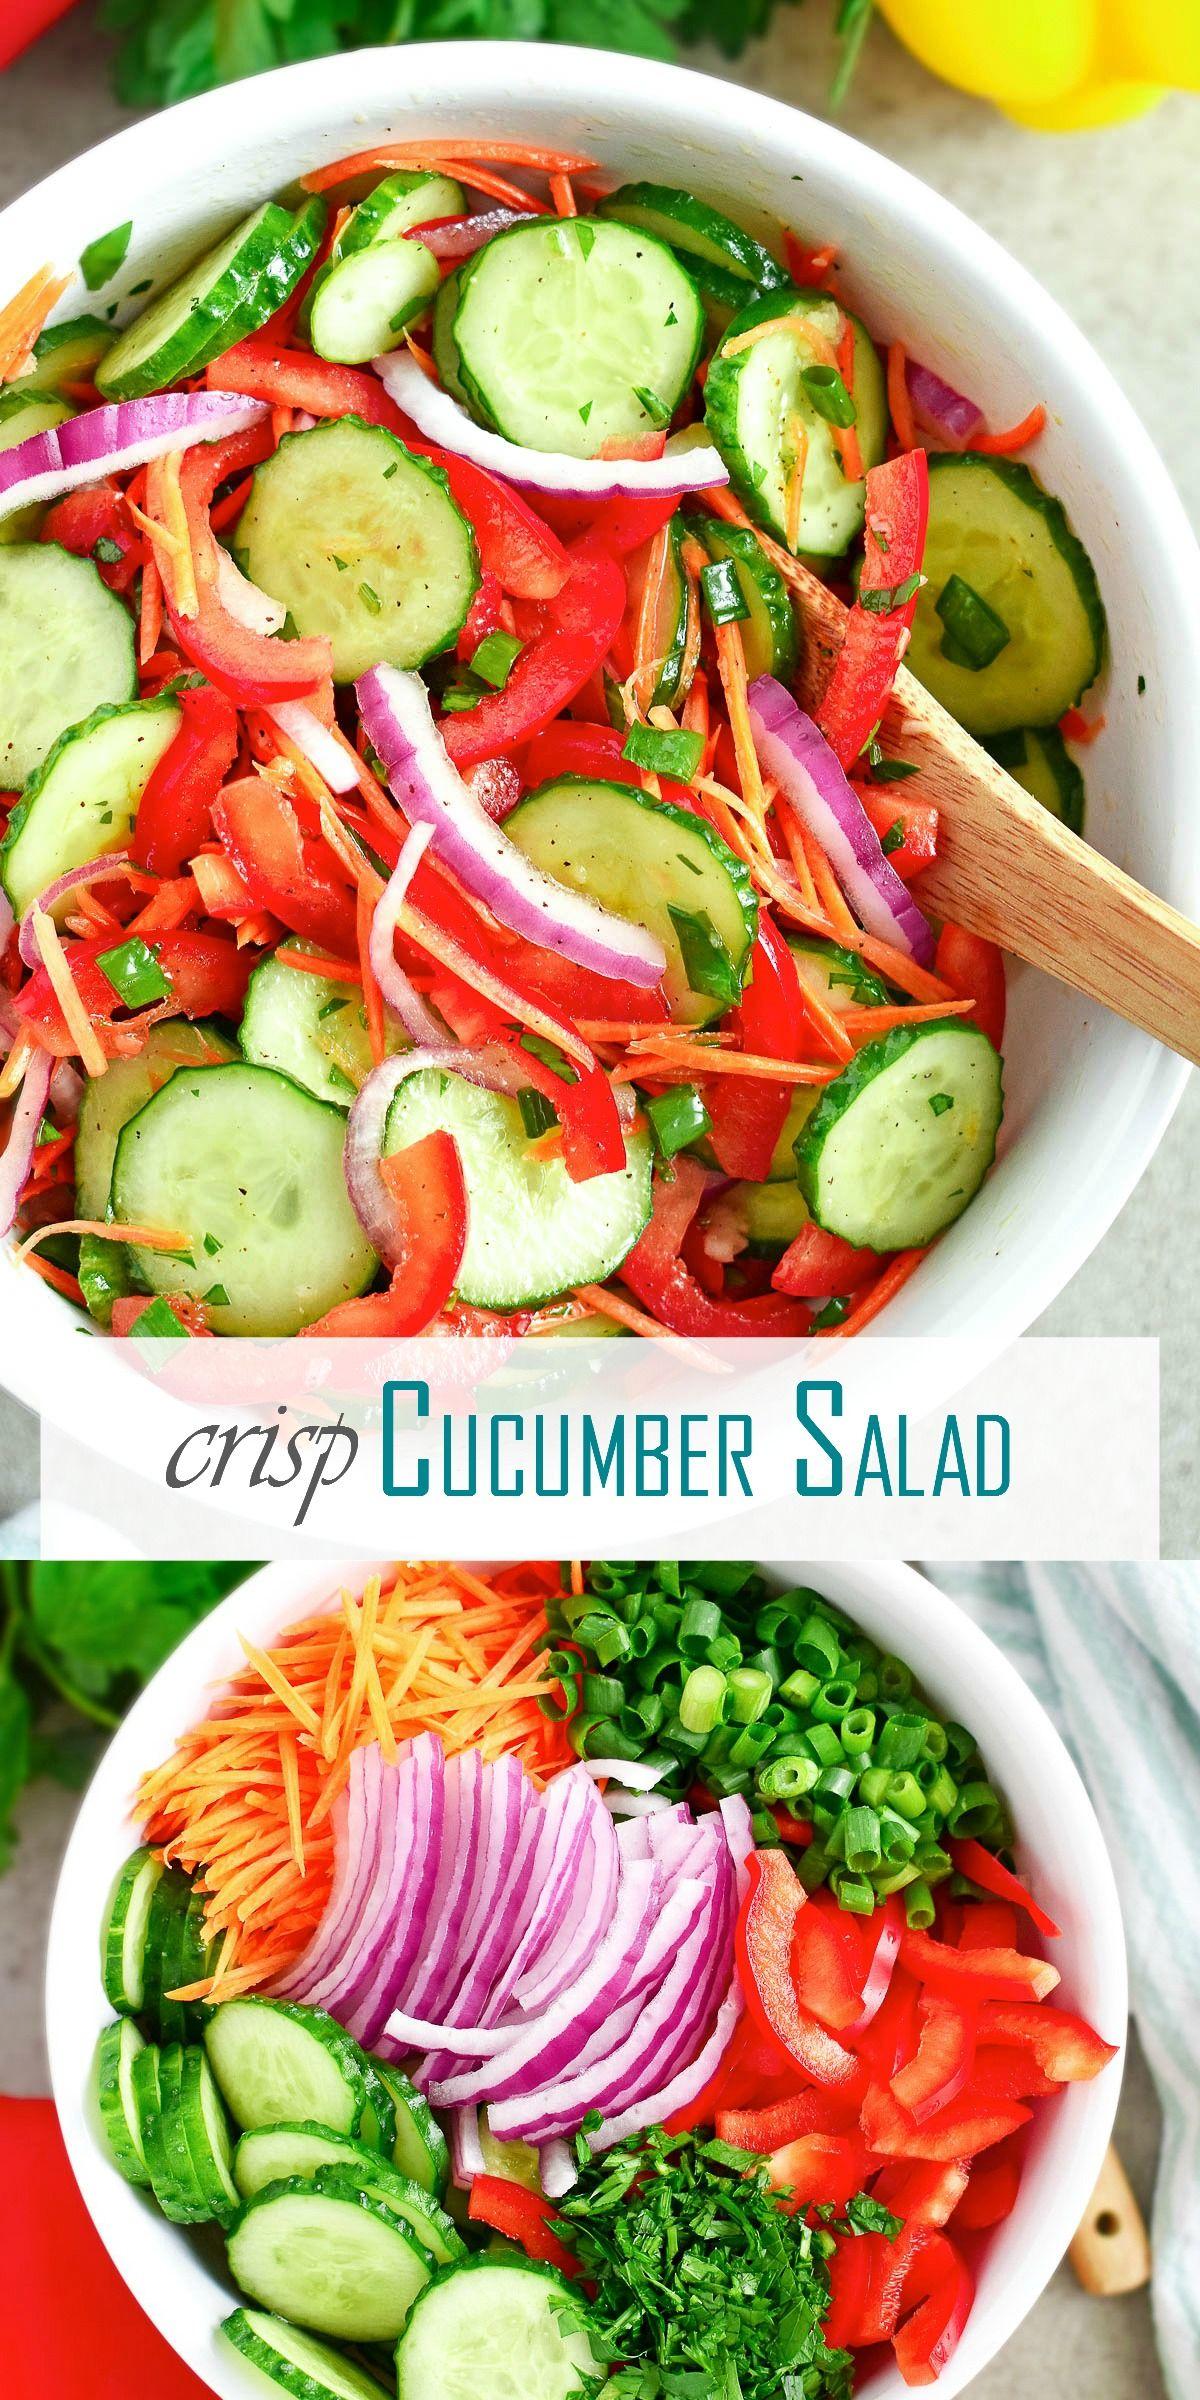 Crisp Cucumber Salad Olga In The Kitchen Recipe Healthy Salad Recipes Fresh Veggies Chicken Salad Recipes